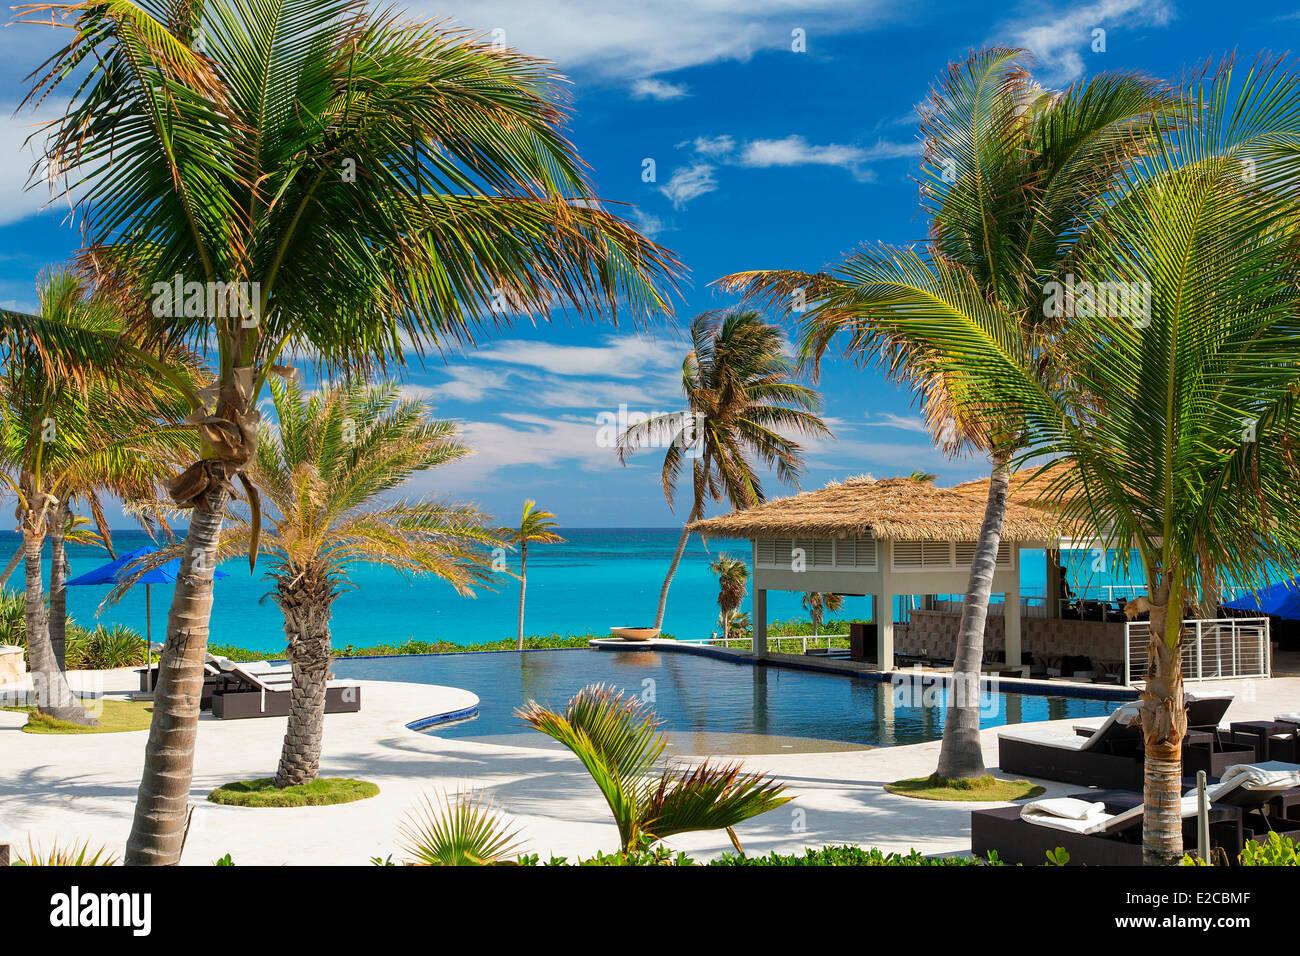 Bahamas, Eleuthera Island, The Sky beach Club Hotel - Stock Image